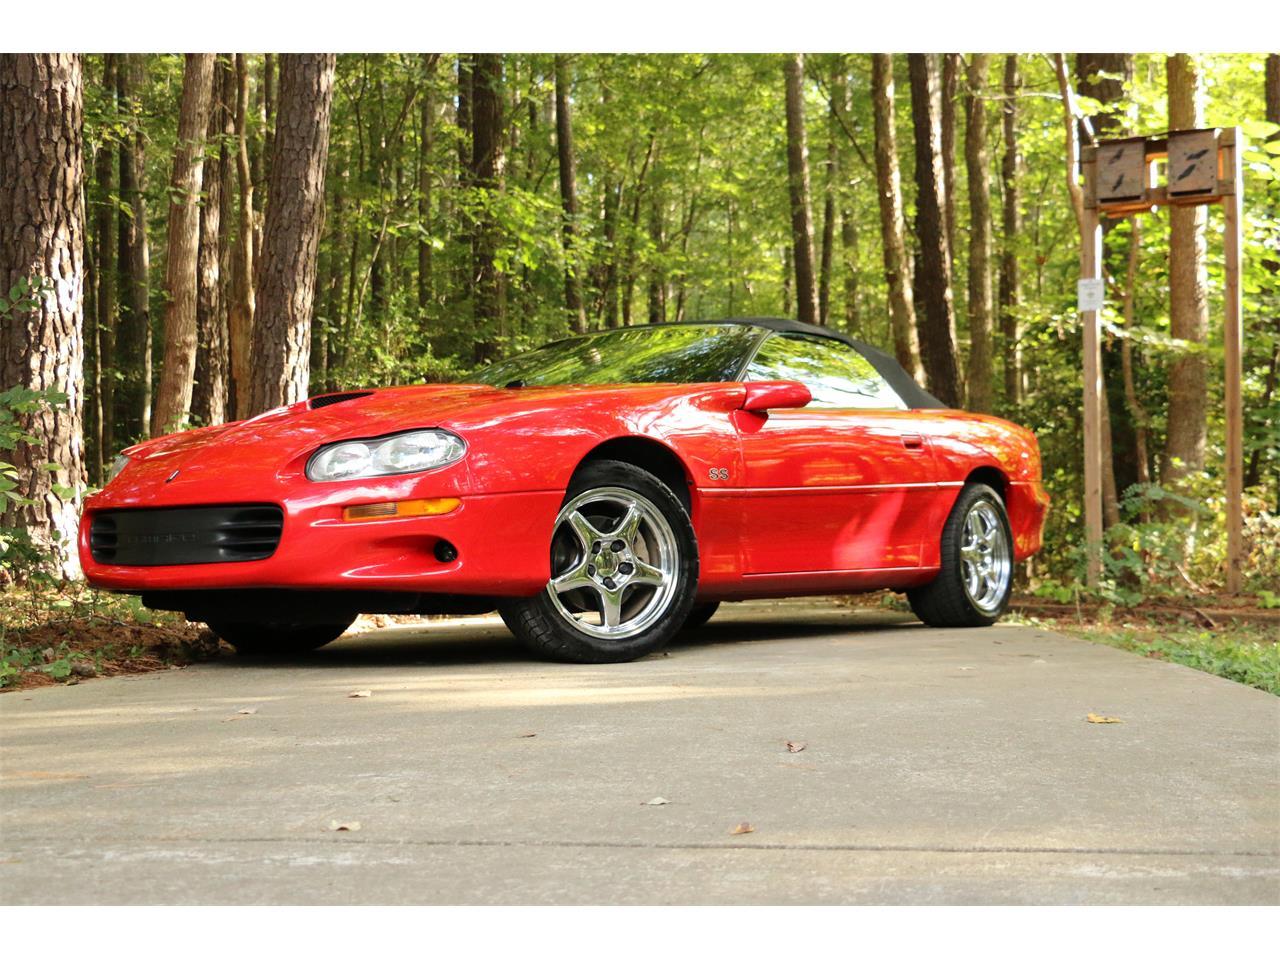 1998 Chevrolet Camaro SS Z28 (CC-1262666) for sale in Cary, North Carolina